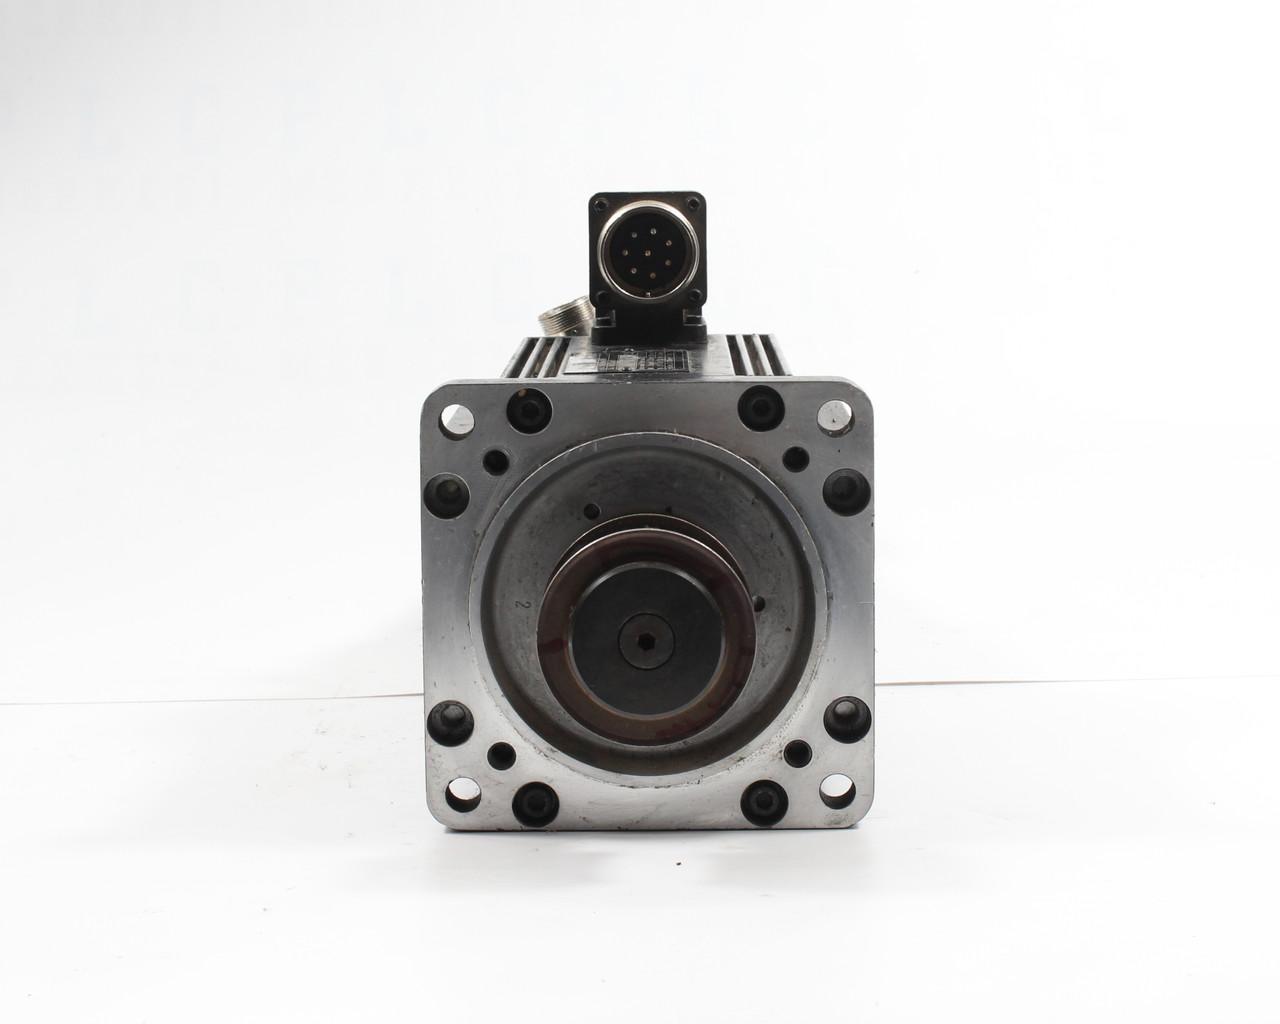 MAC090A-0-ZD-1-B-110-A-0-I22625-S001 SERVOMOTOR INDRAMAT